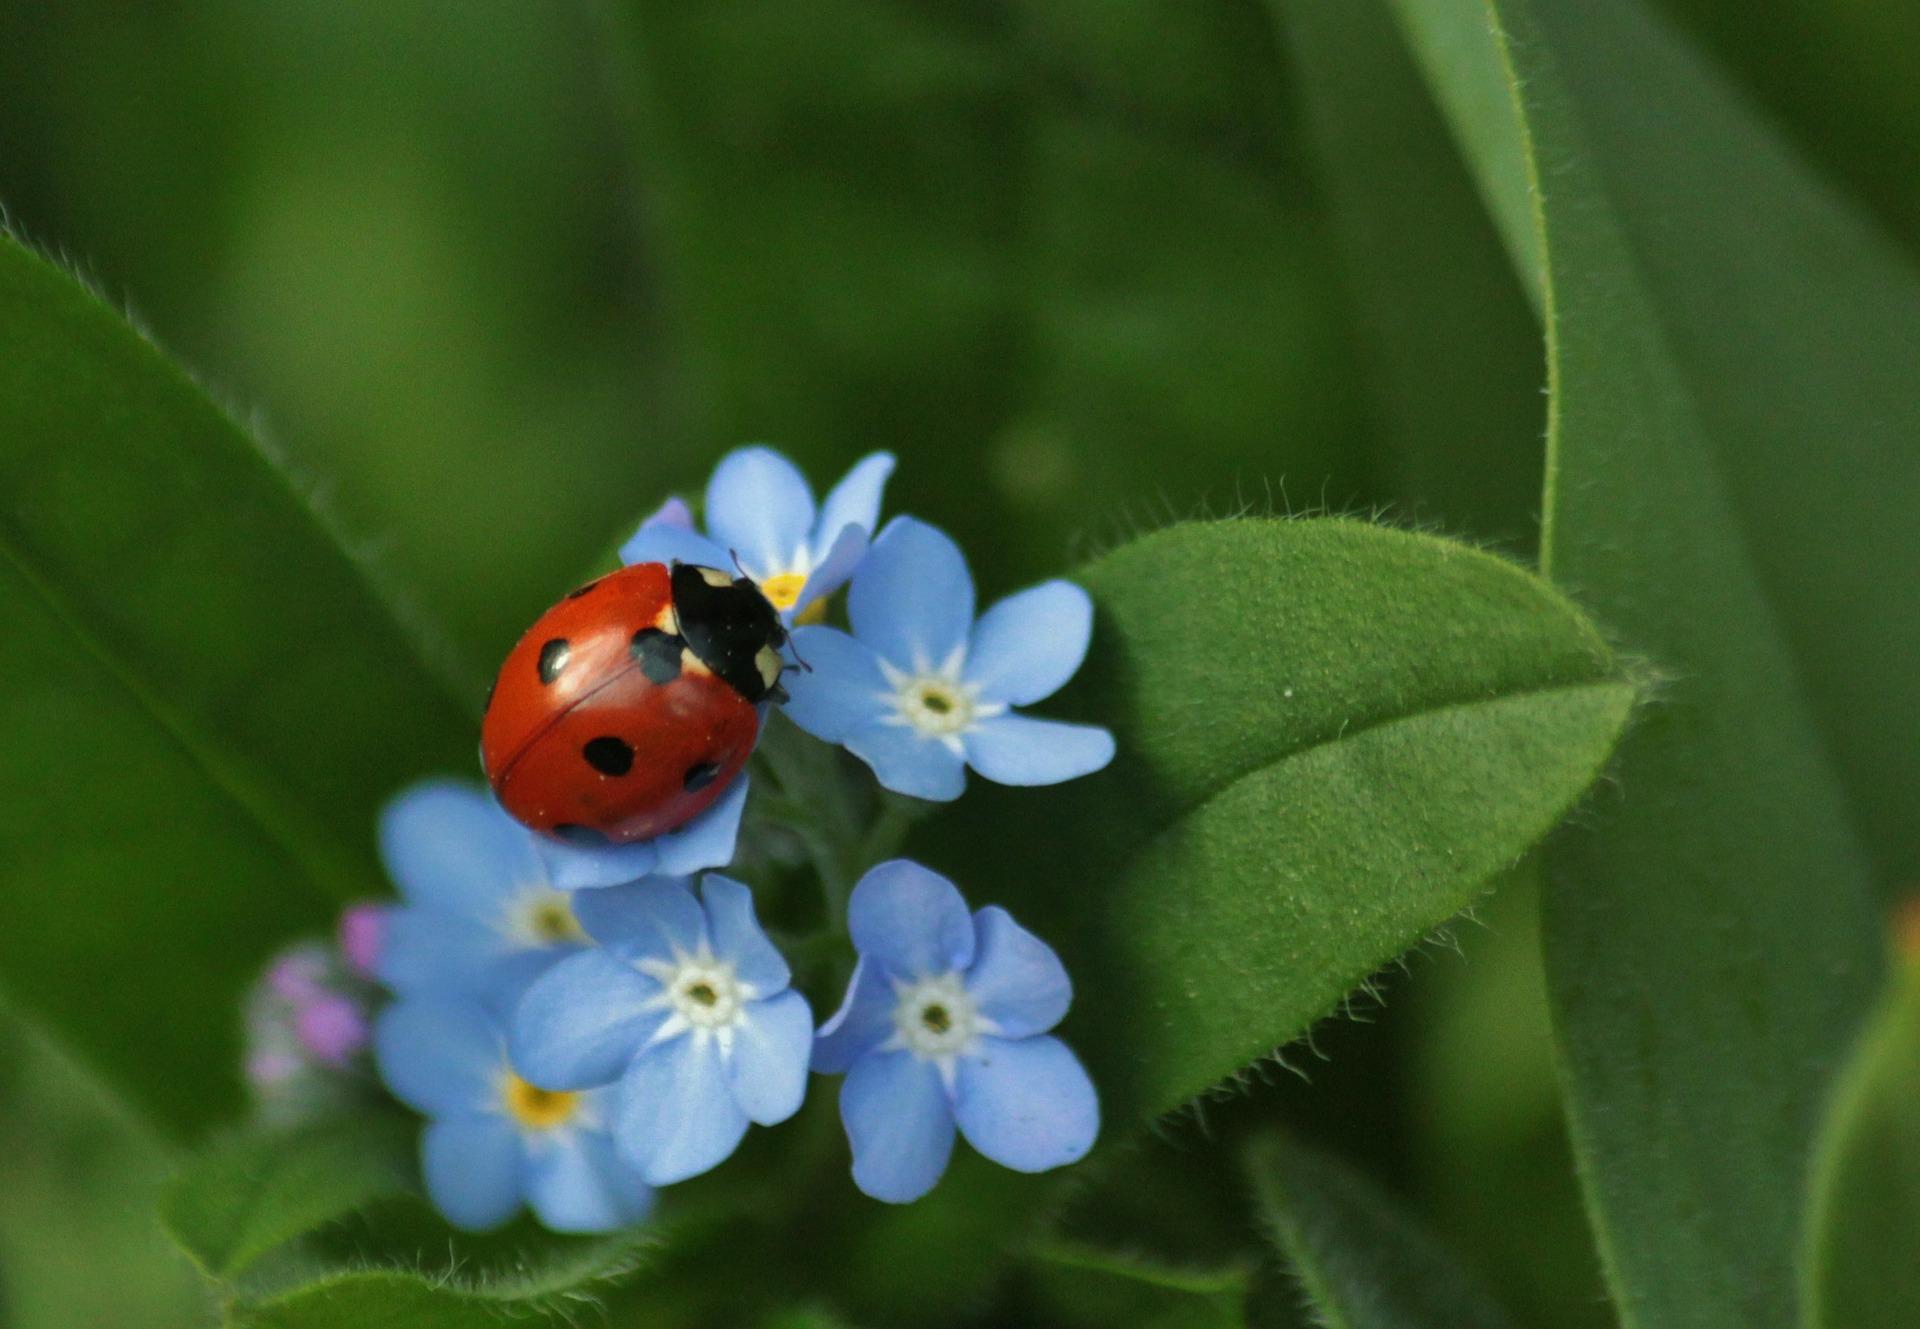 ladybug-308215_1920.jpg